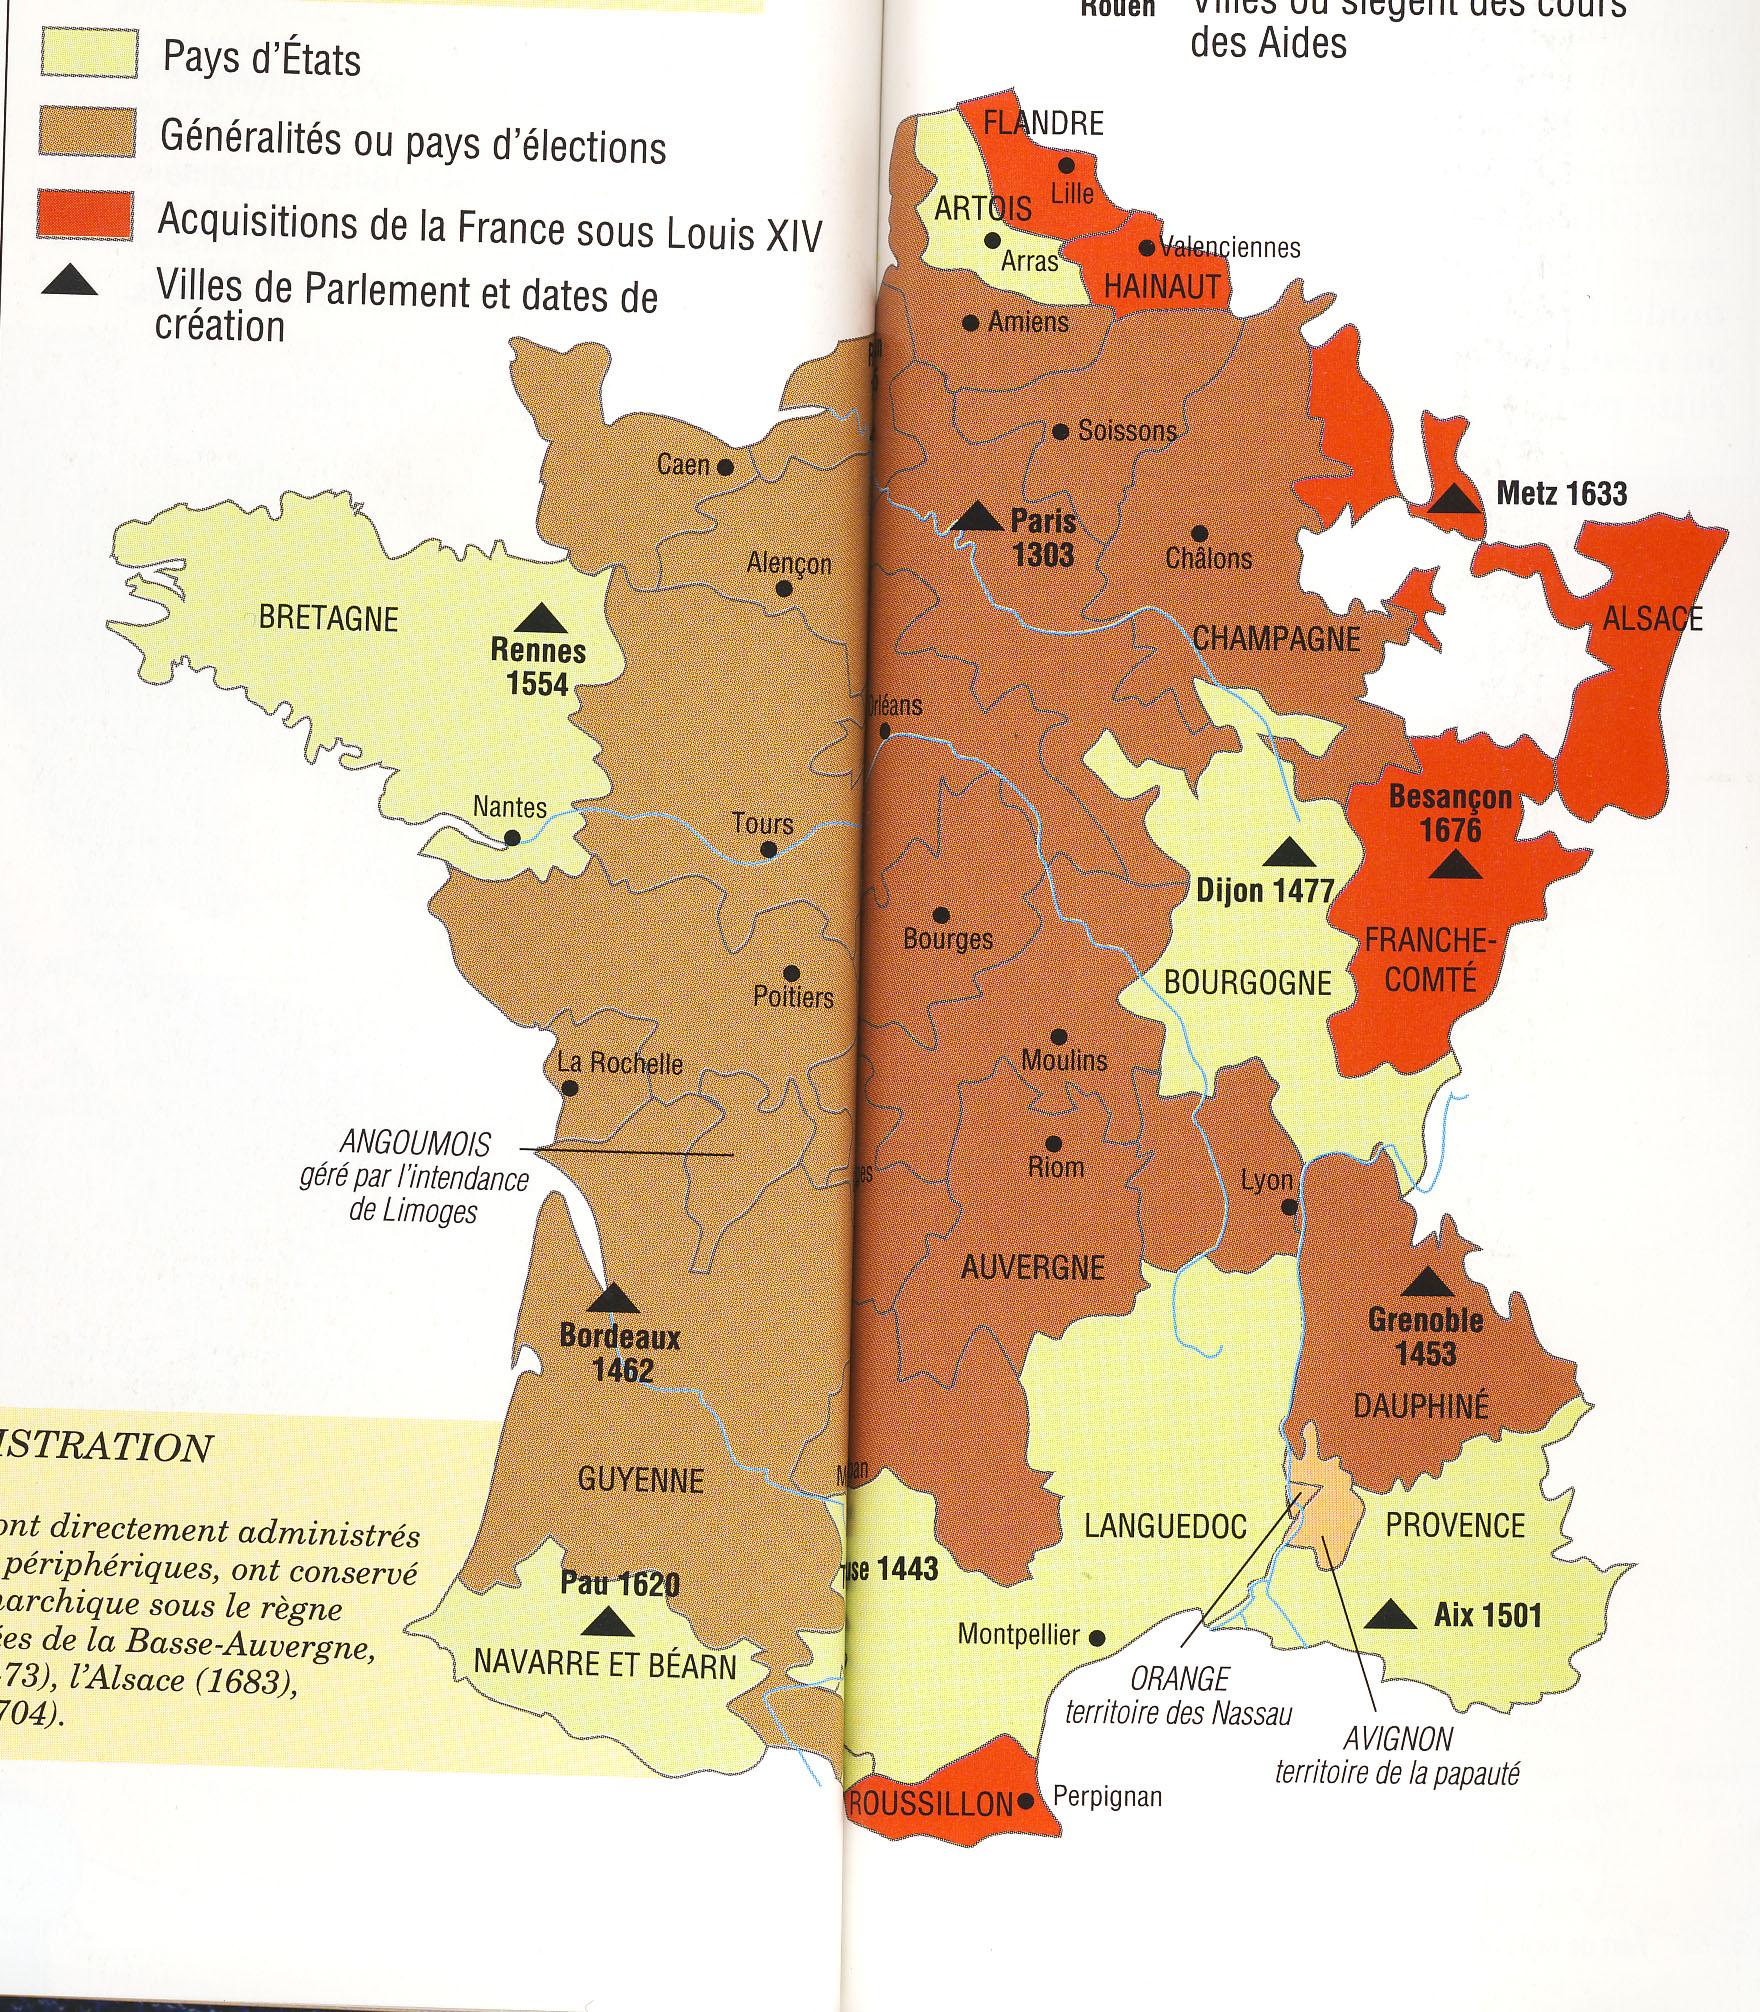 Index of /~mapplace/EU/EU20_France/Maps/15-16thCent